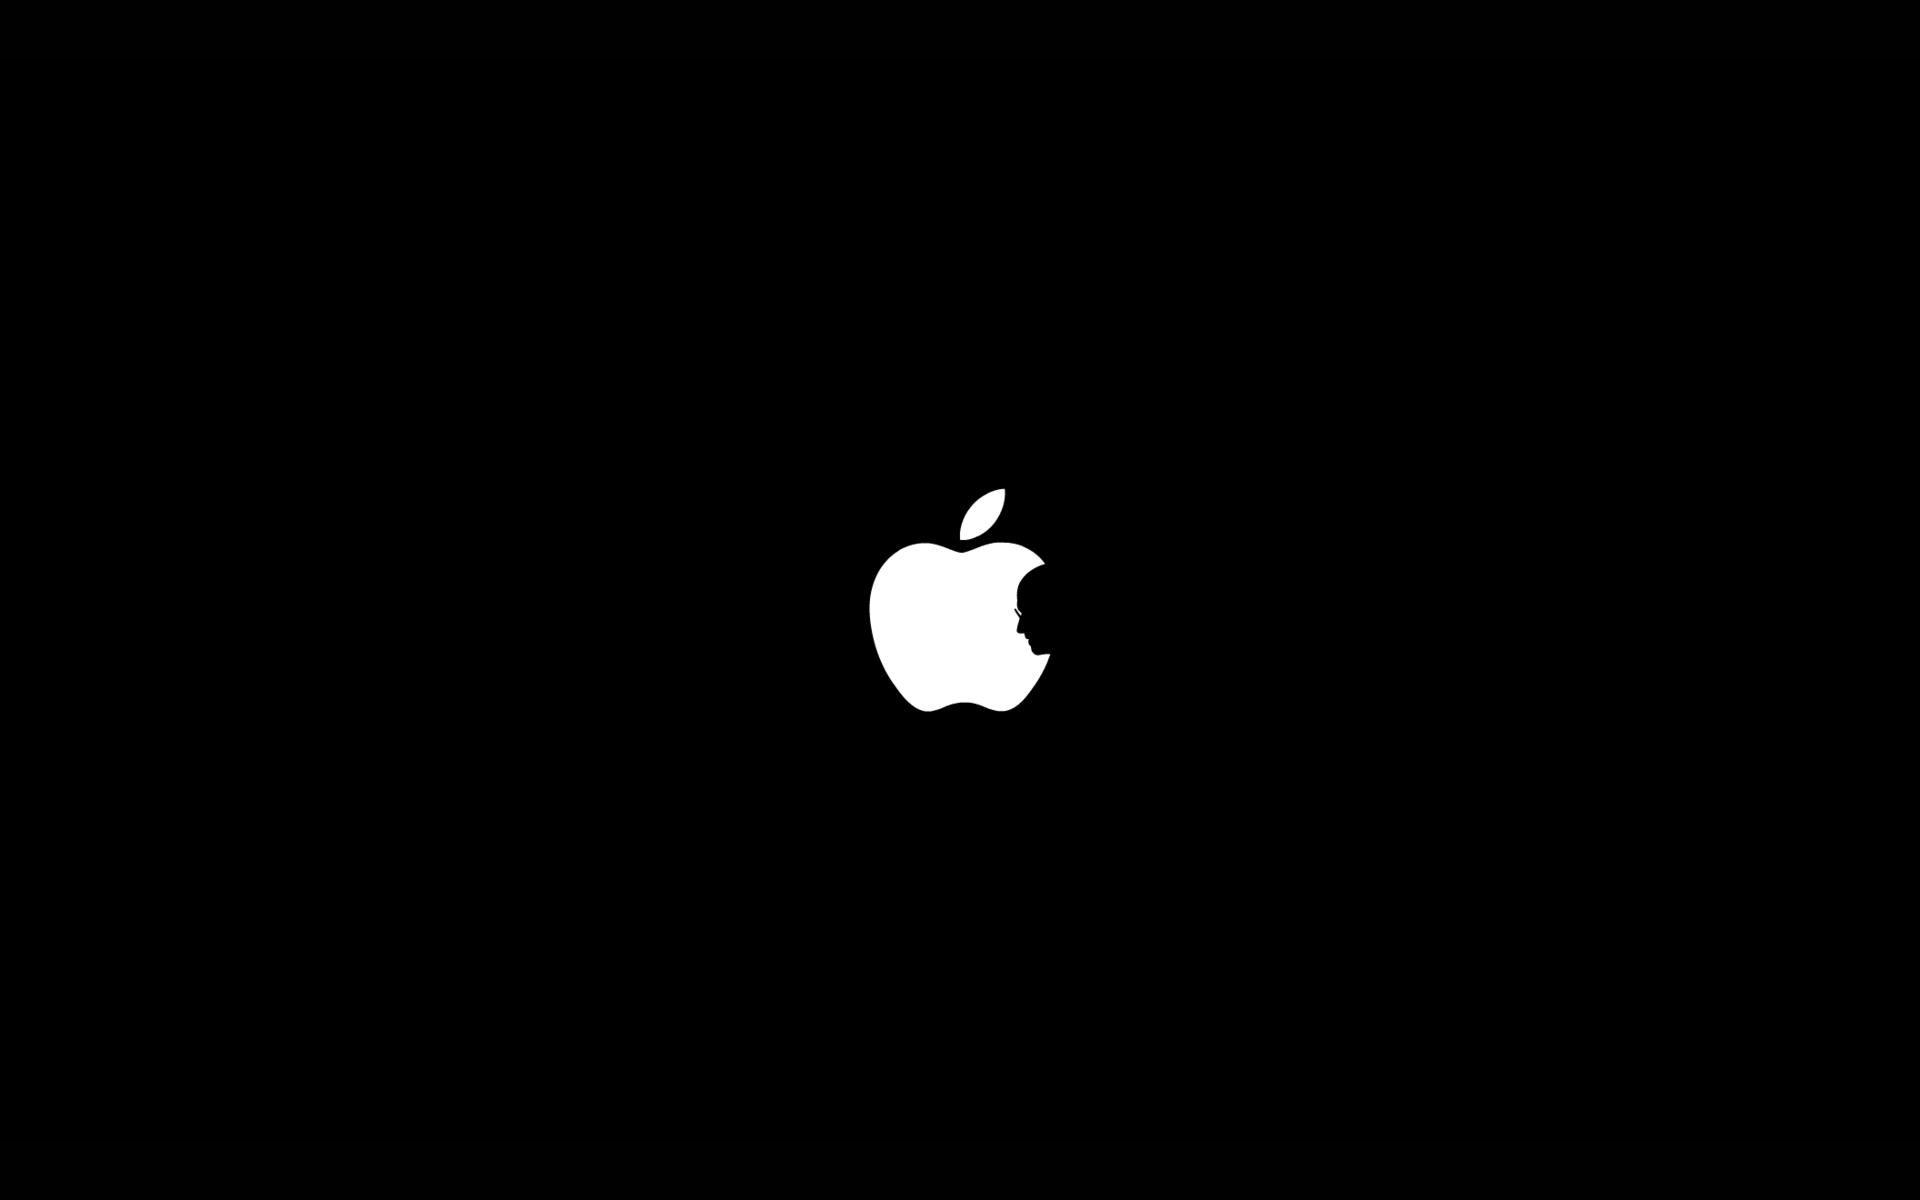 apple-logo-computer-hd-wallpaper-1920x1200-5993